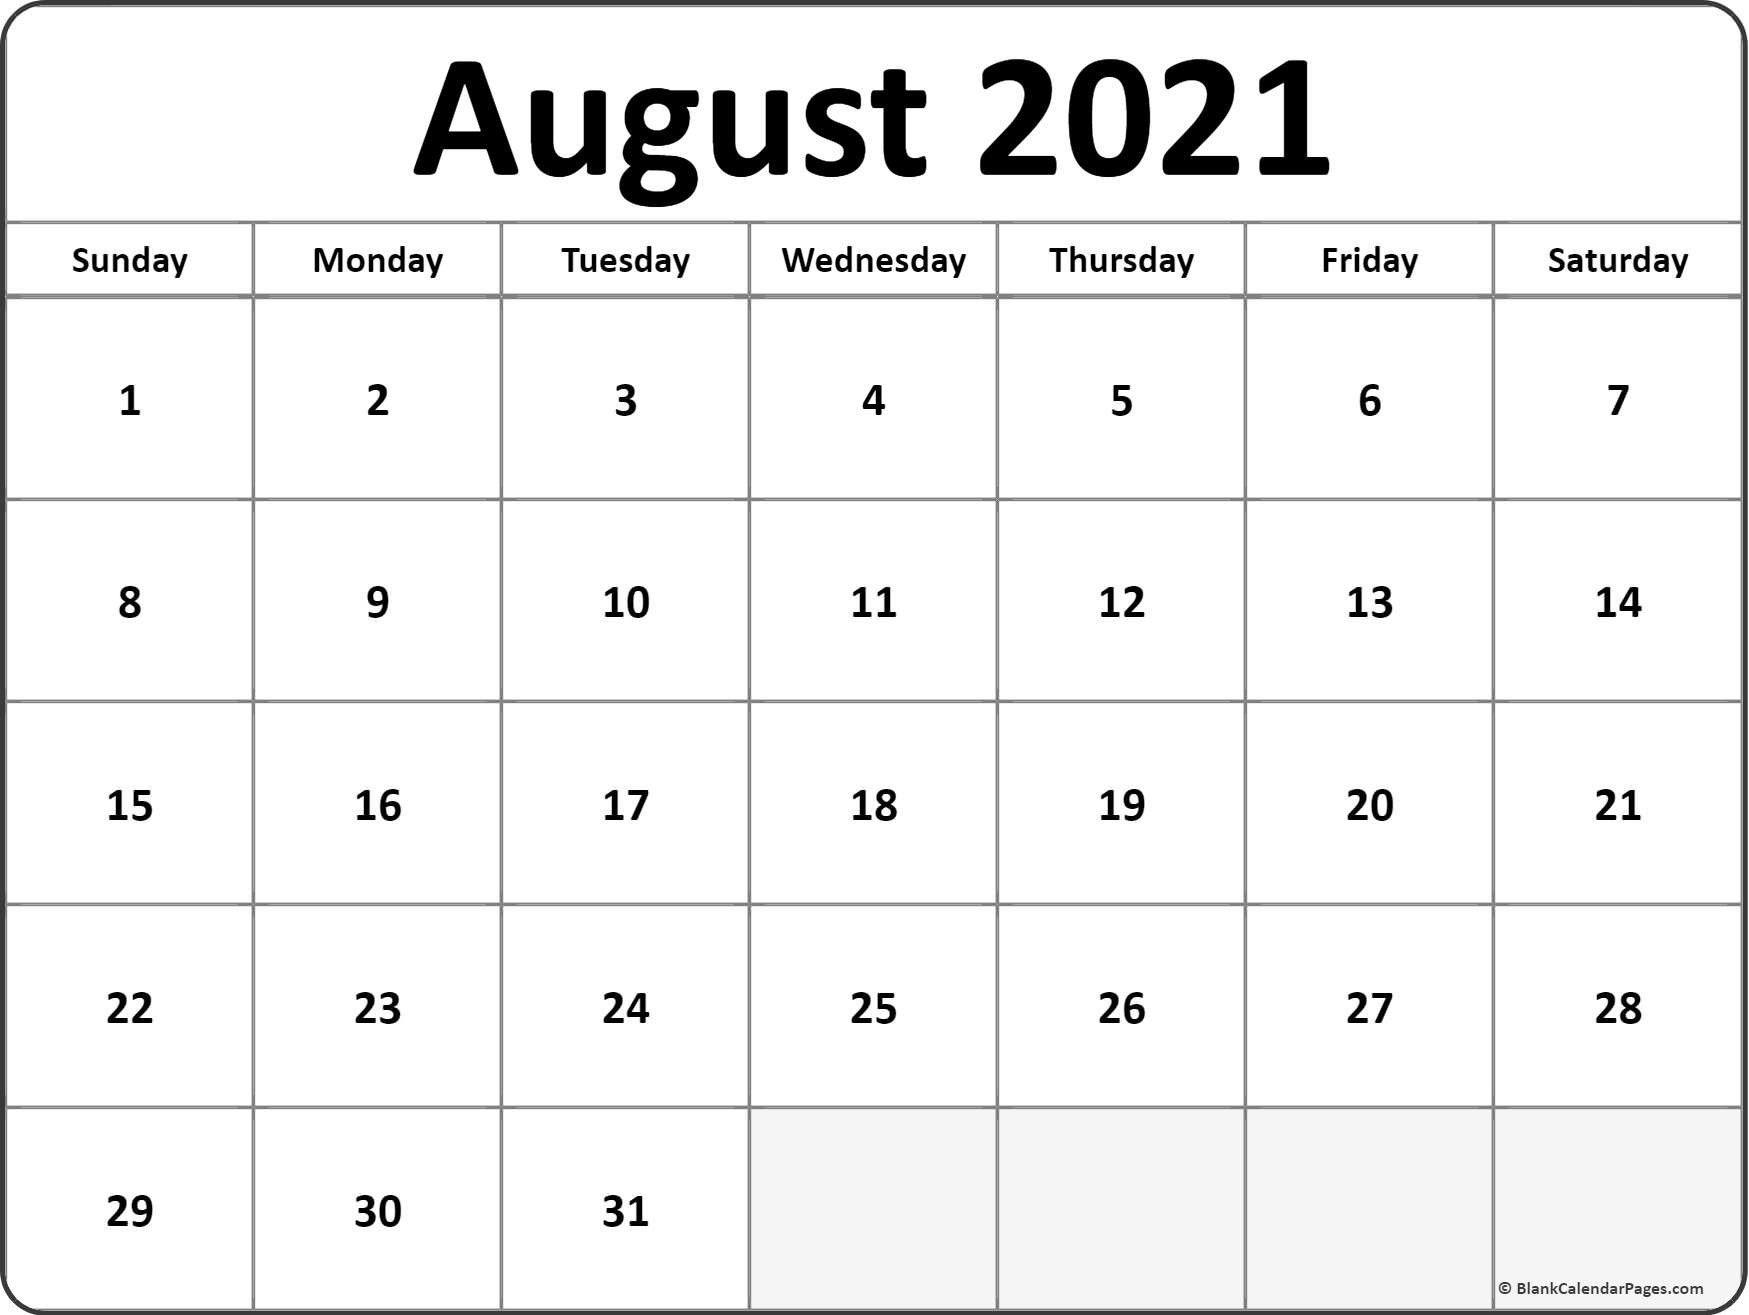 Get August 2021 Printable Calendars